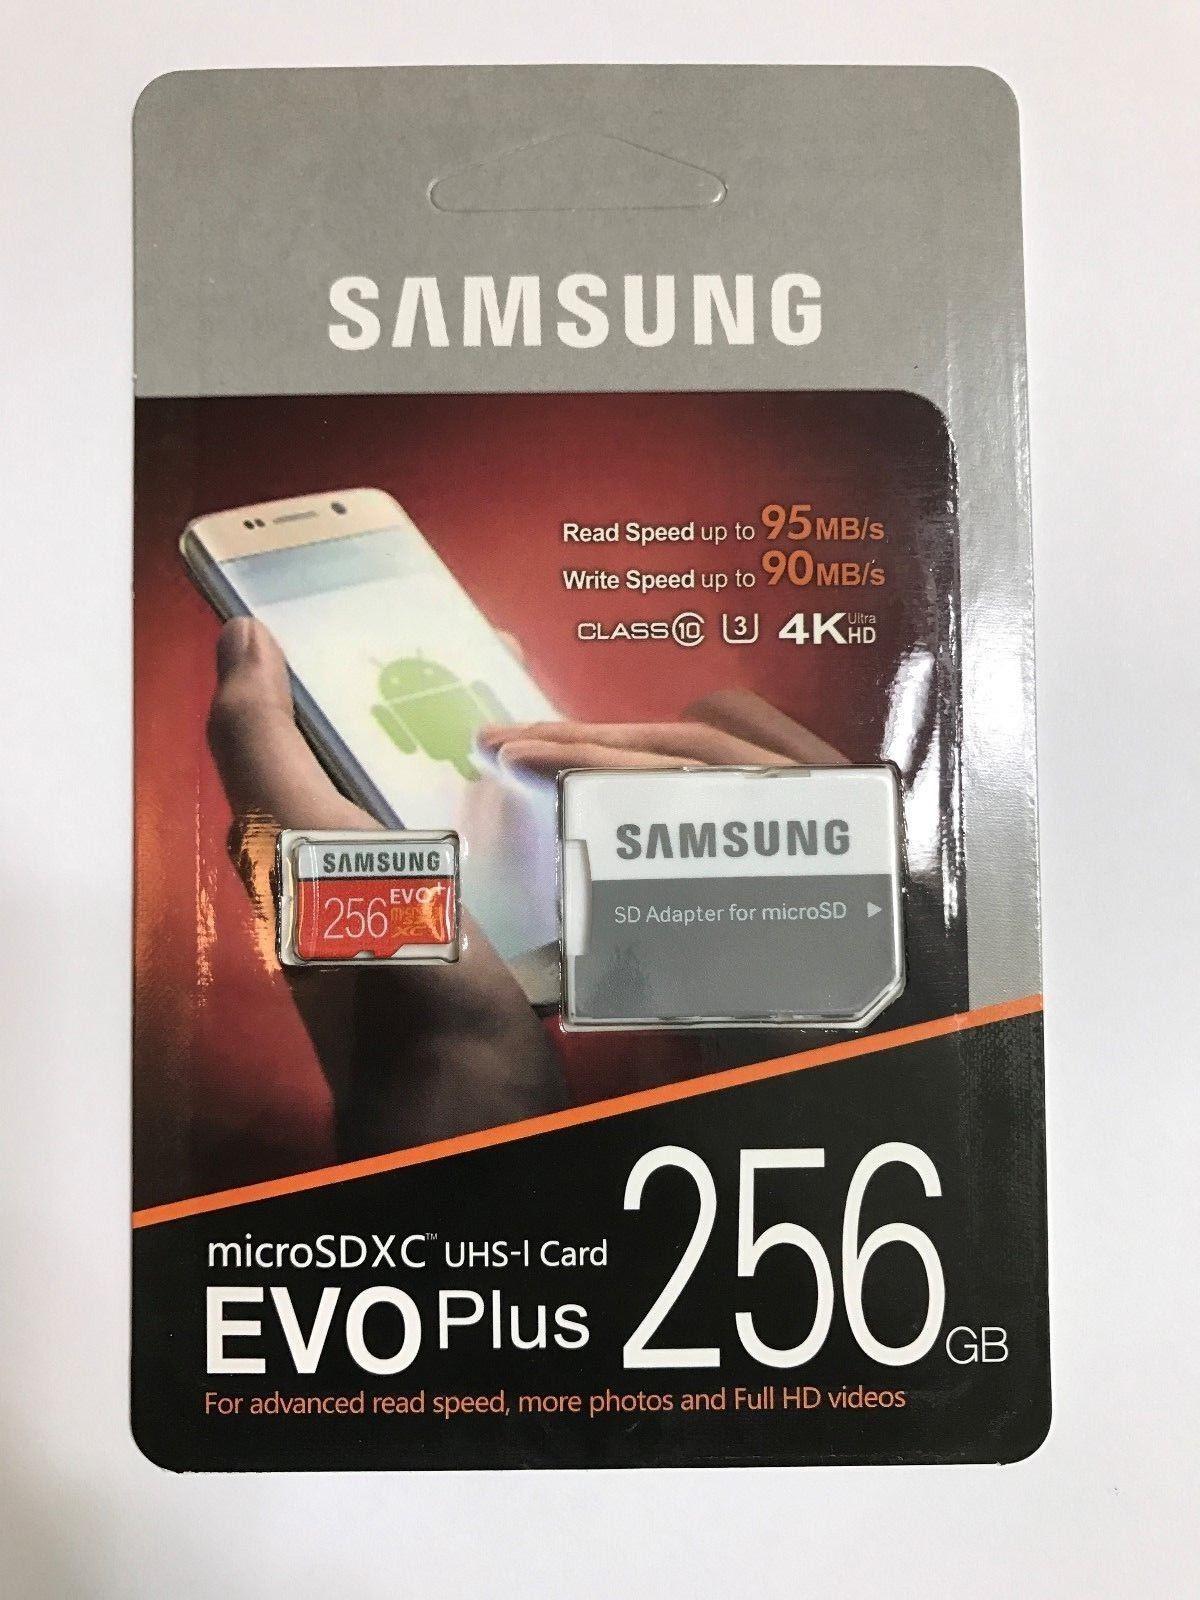 Samsung EVO+ 256 GB microSDXC - Class 10/UHS-I  - 95 MB/s Re